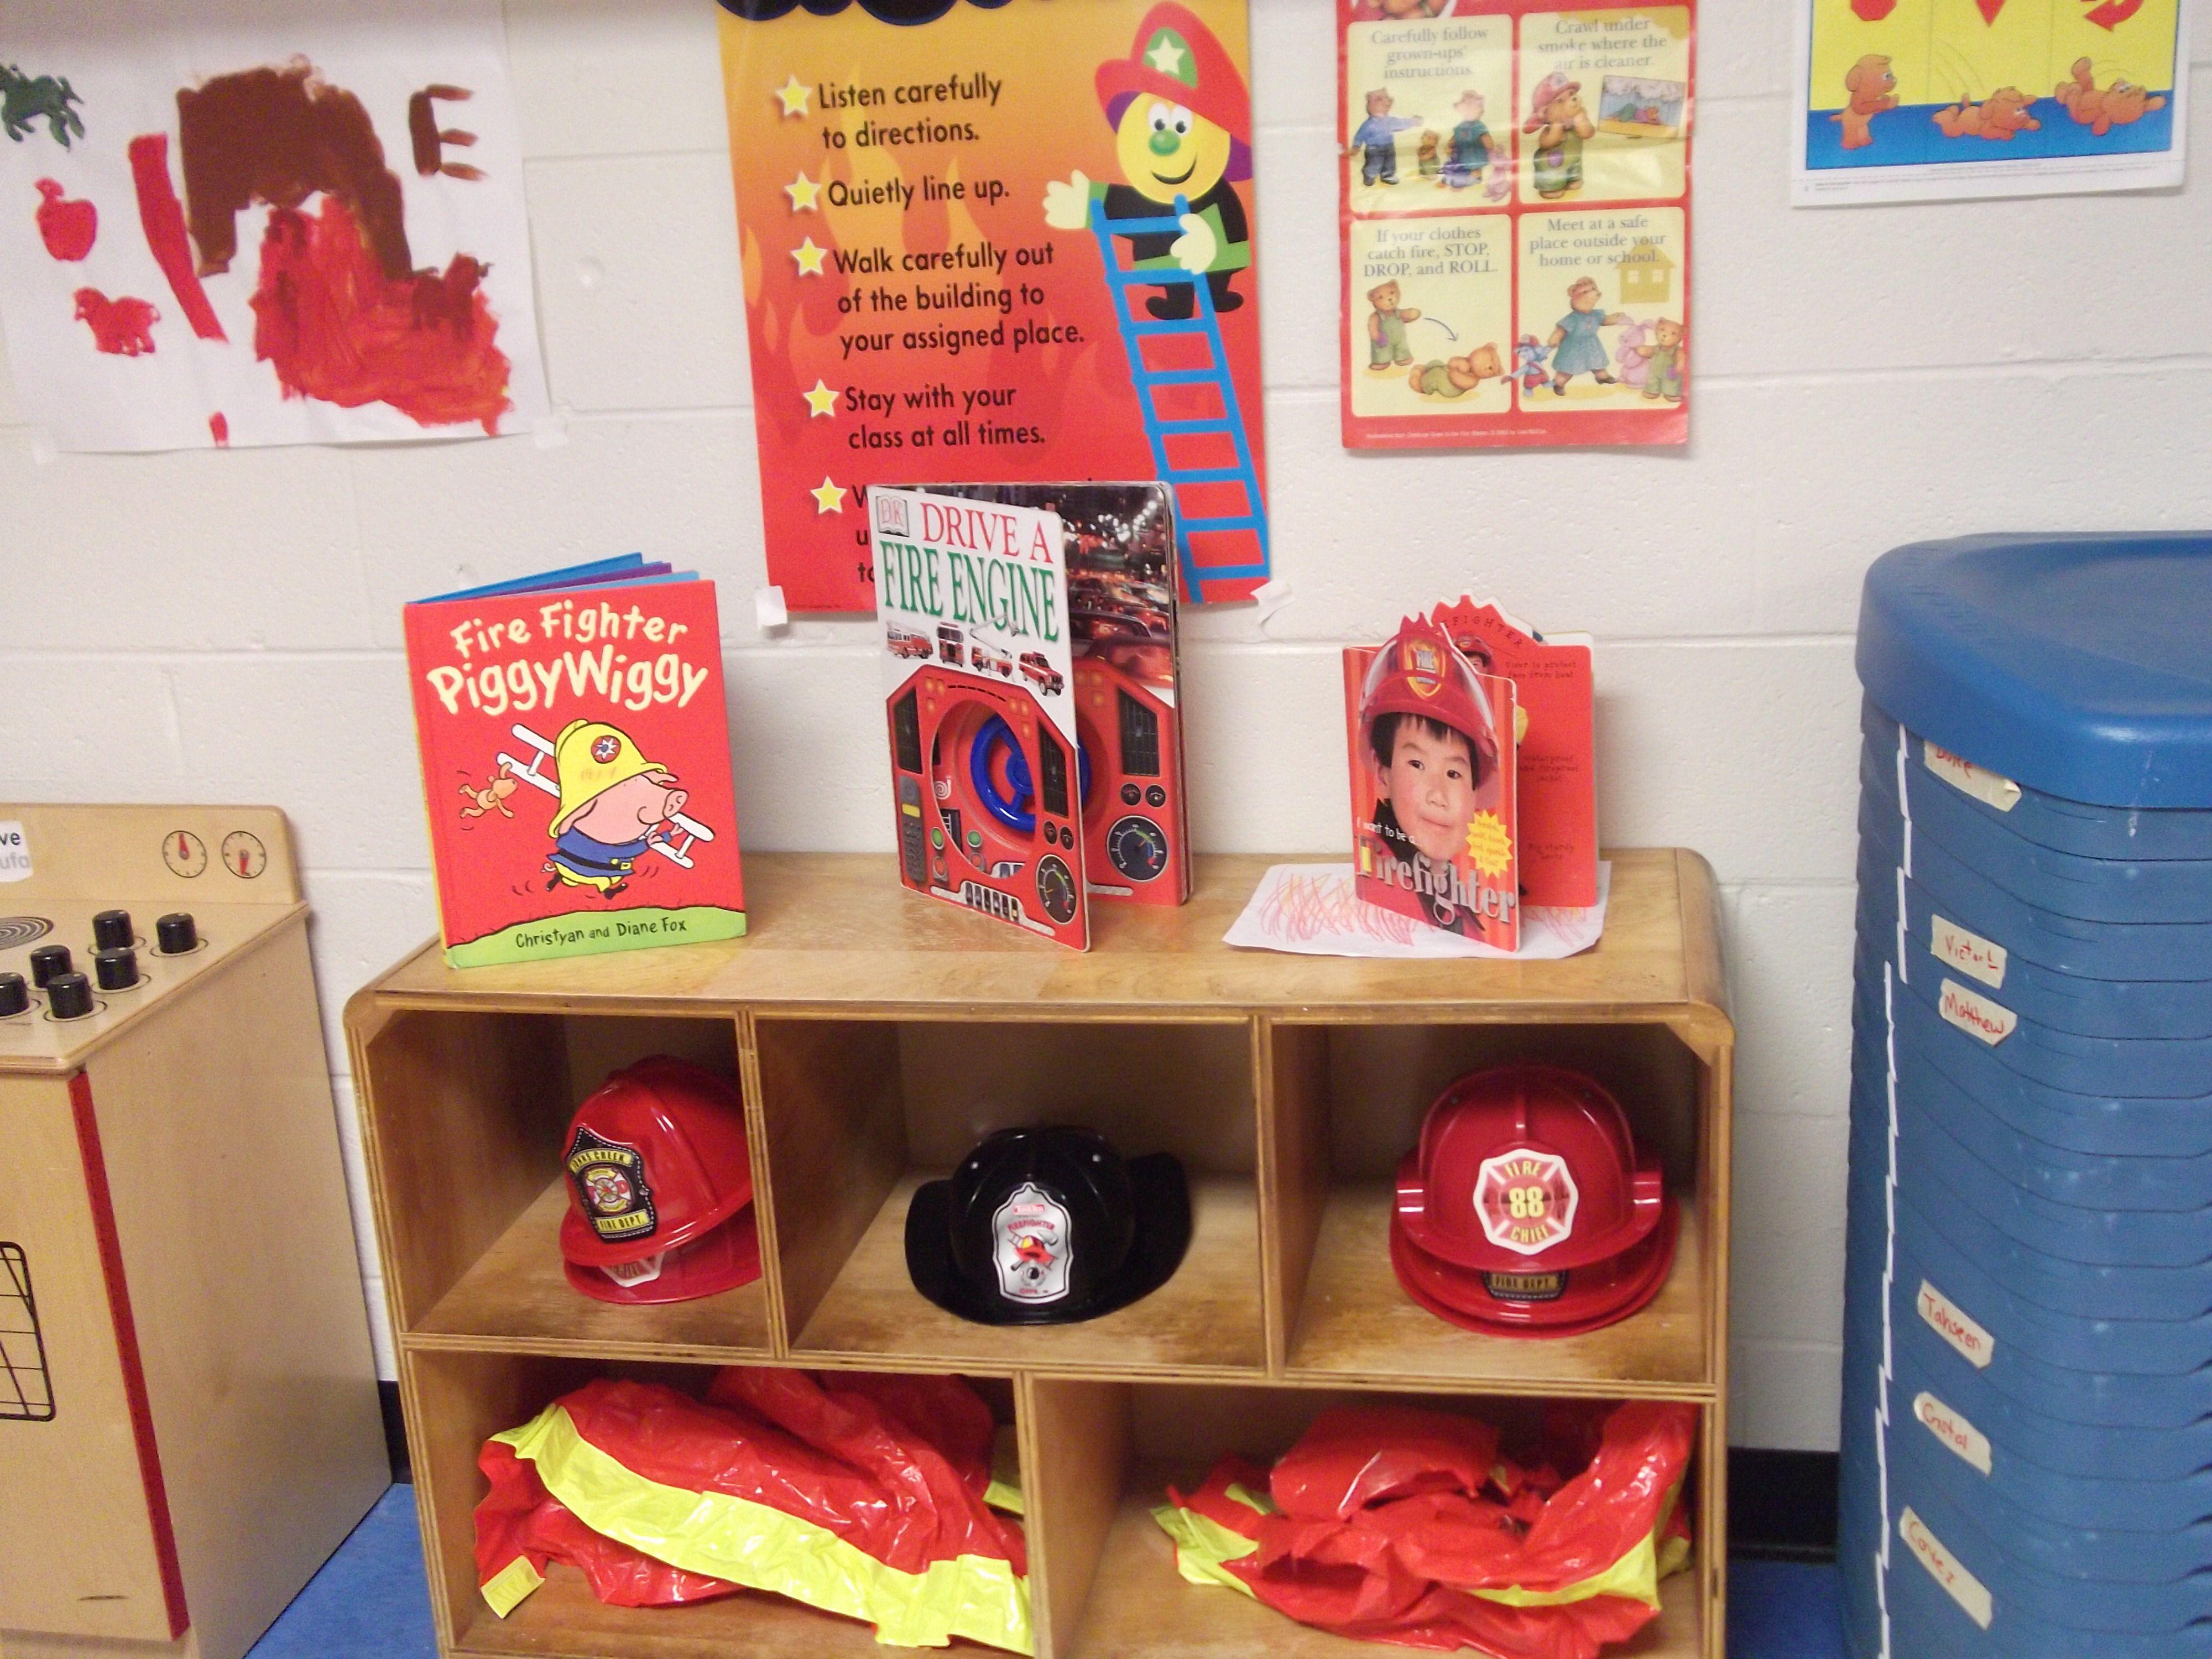 Fire Station Dramatic Play Prop Center Dramatic Play Preschool Dramatic Play Themes Fire Safety Preschool